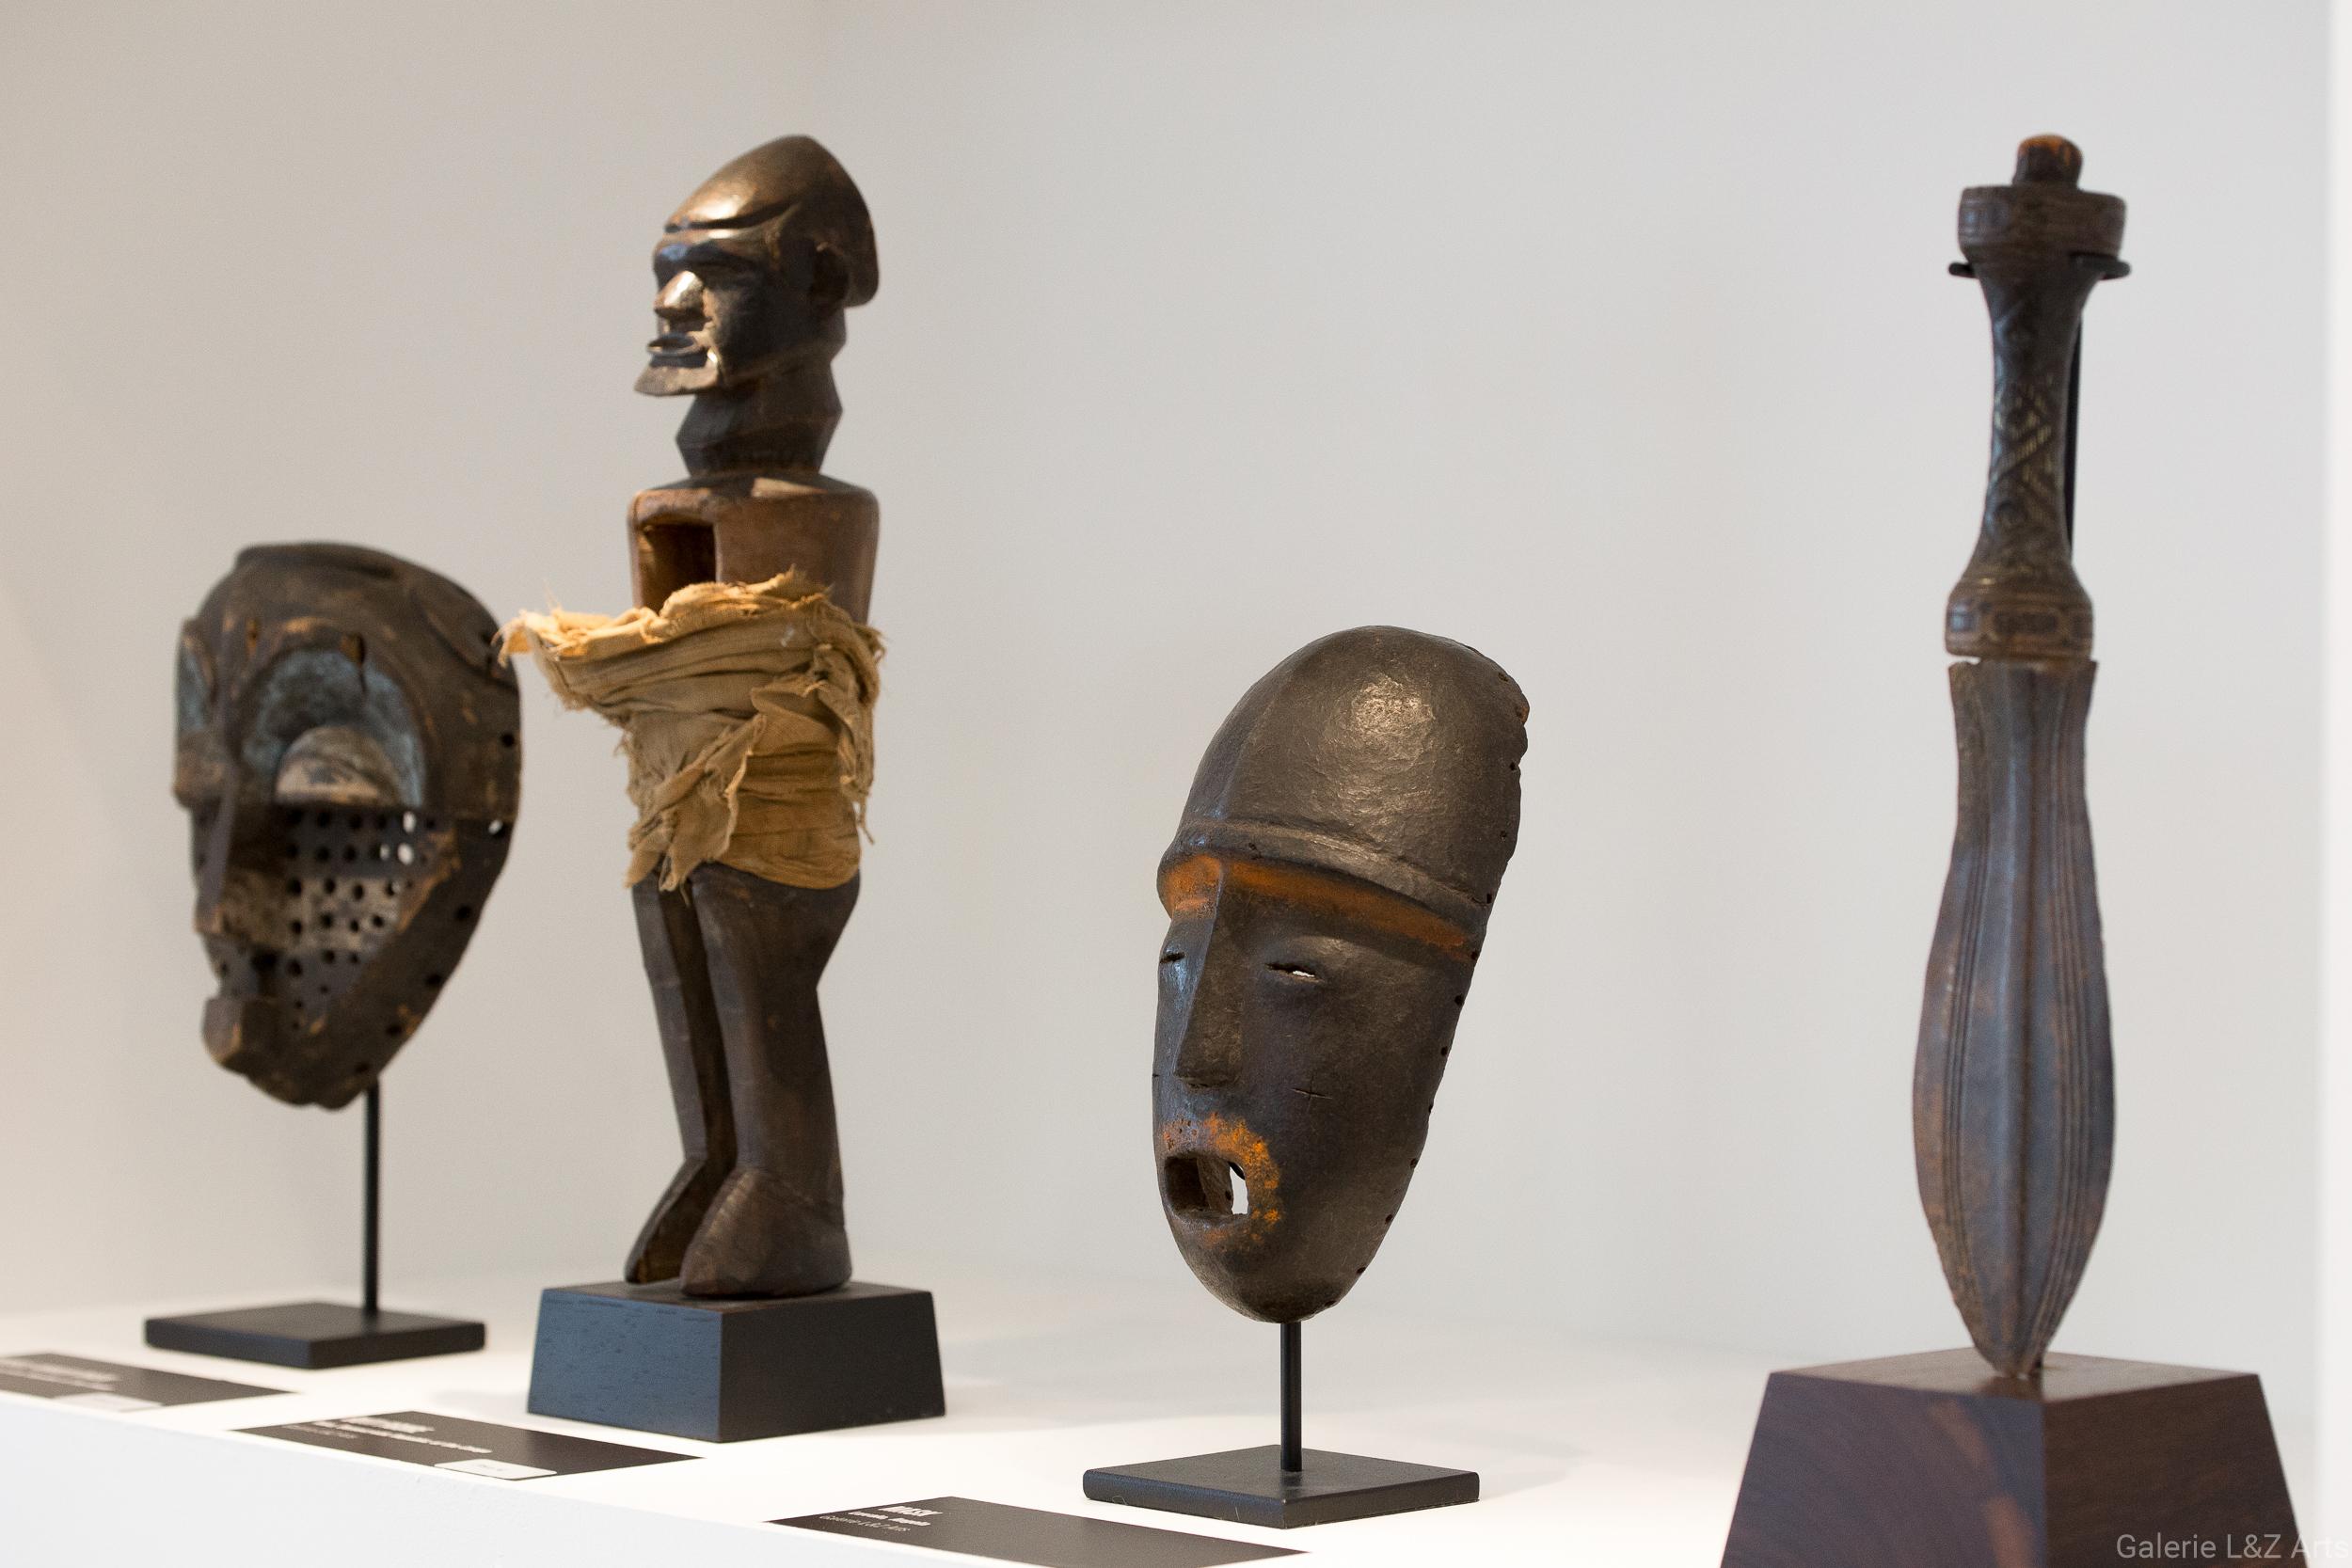 tribal-art-oostende-ostende-exposition-galerie-lz-art-africain-belgique-14.jpg